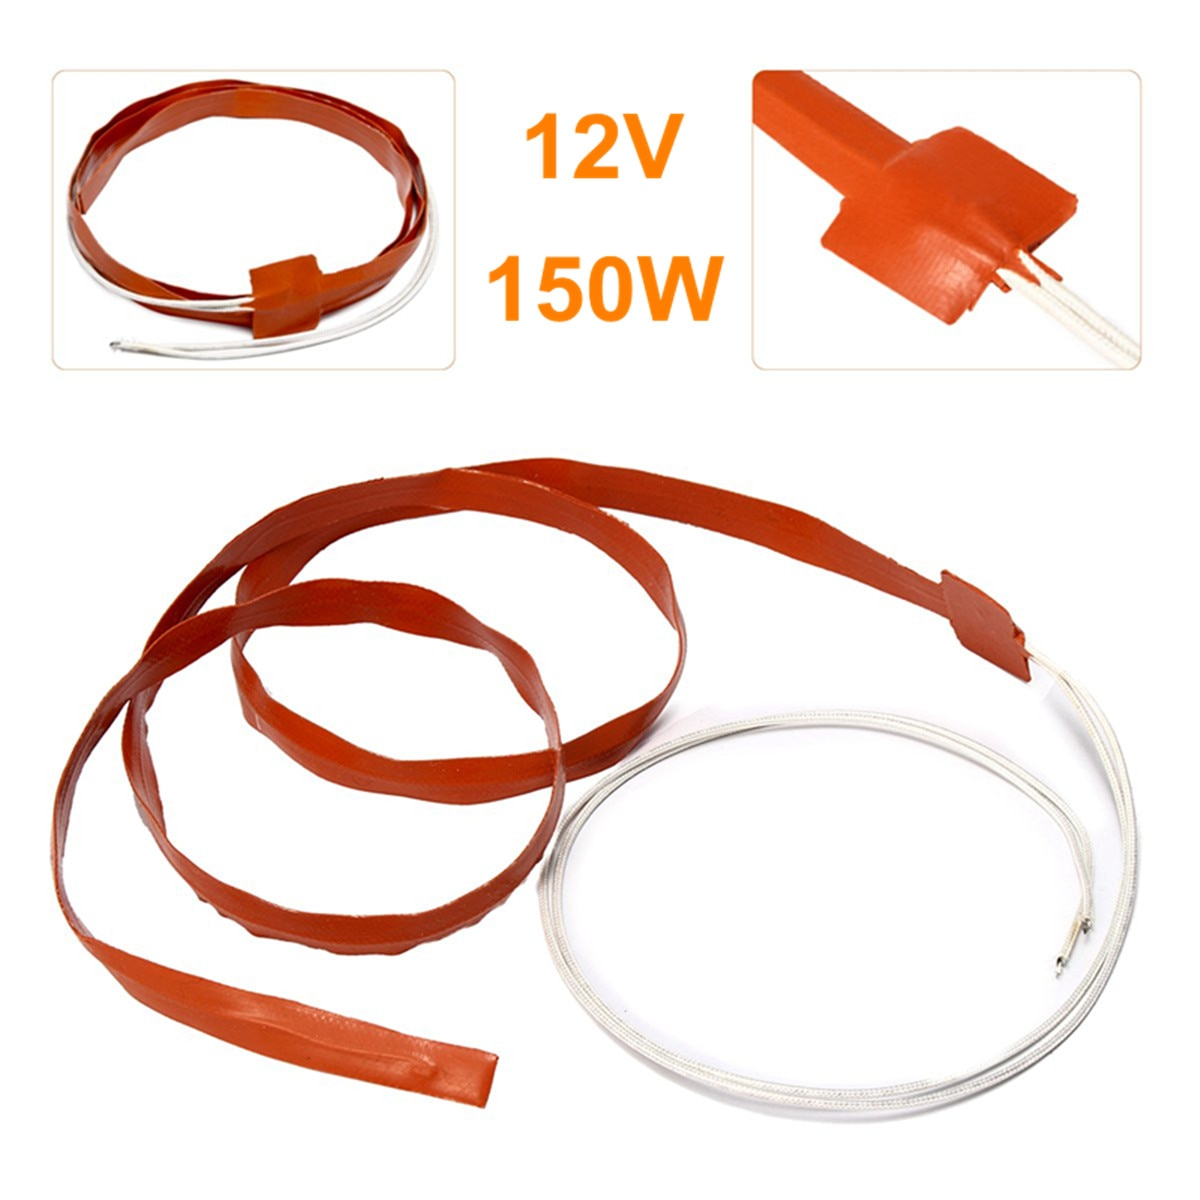 Almohadillas eléctricas de calor de 150W 12V, calentador de silicona de 1200x12mm, tira de calentamiento térmico, tira de calentador de línea Flexible, correa de calentador para inyector calentado